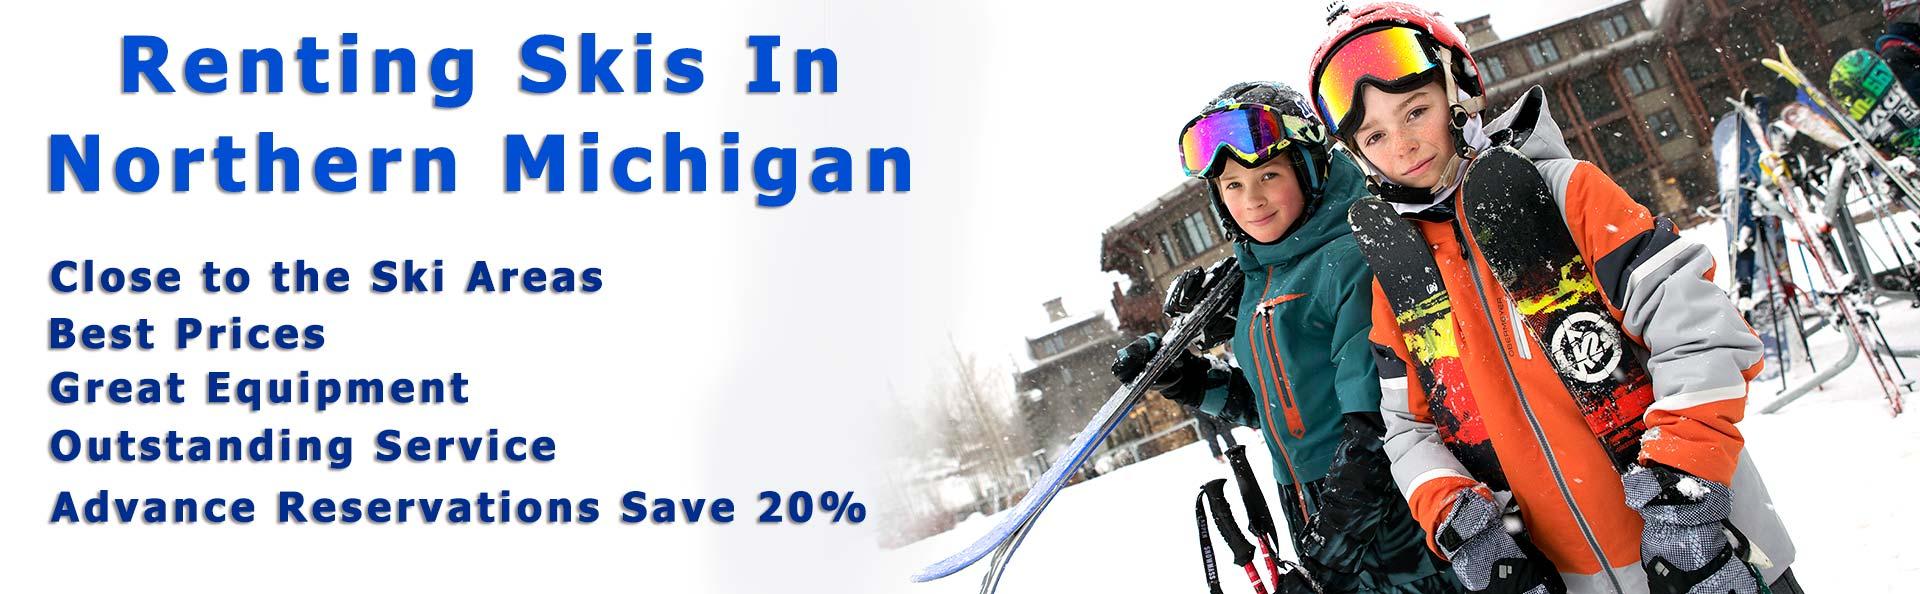 HuReserve Ski & Snowboard Equipment in Norther Michigan